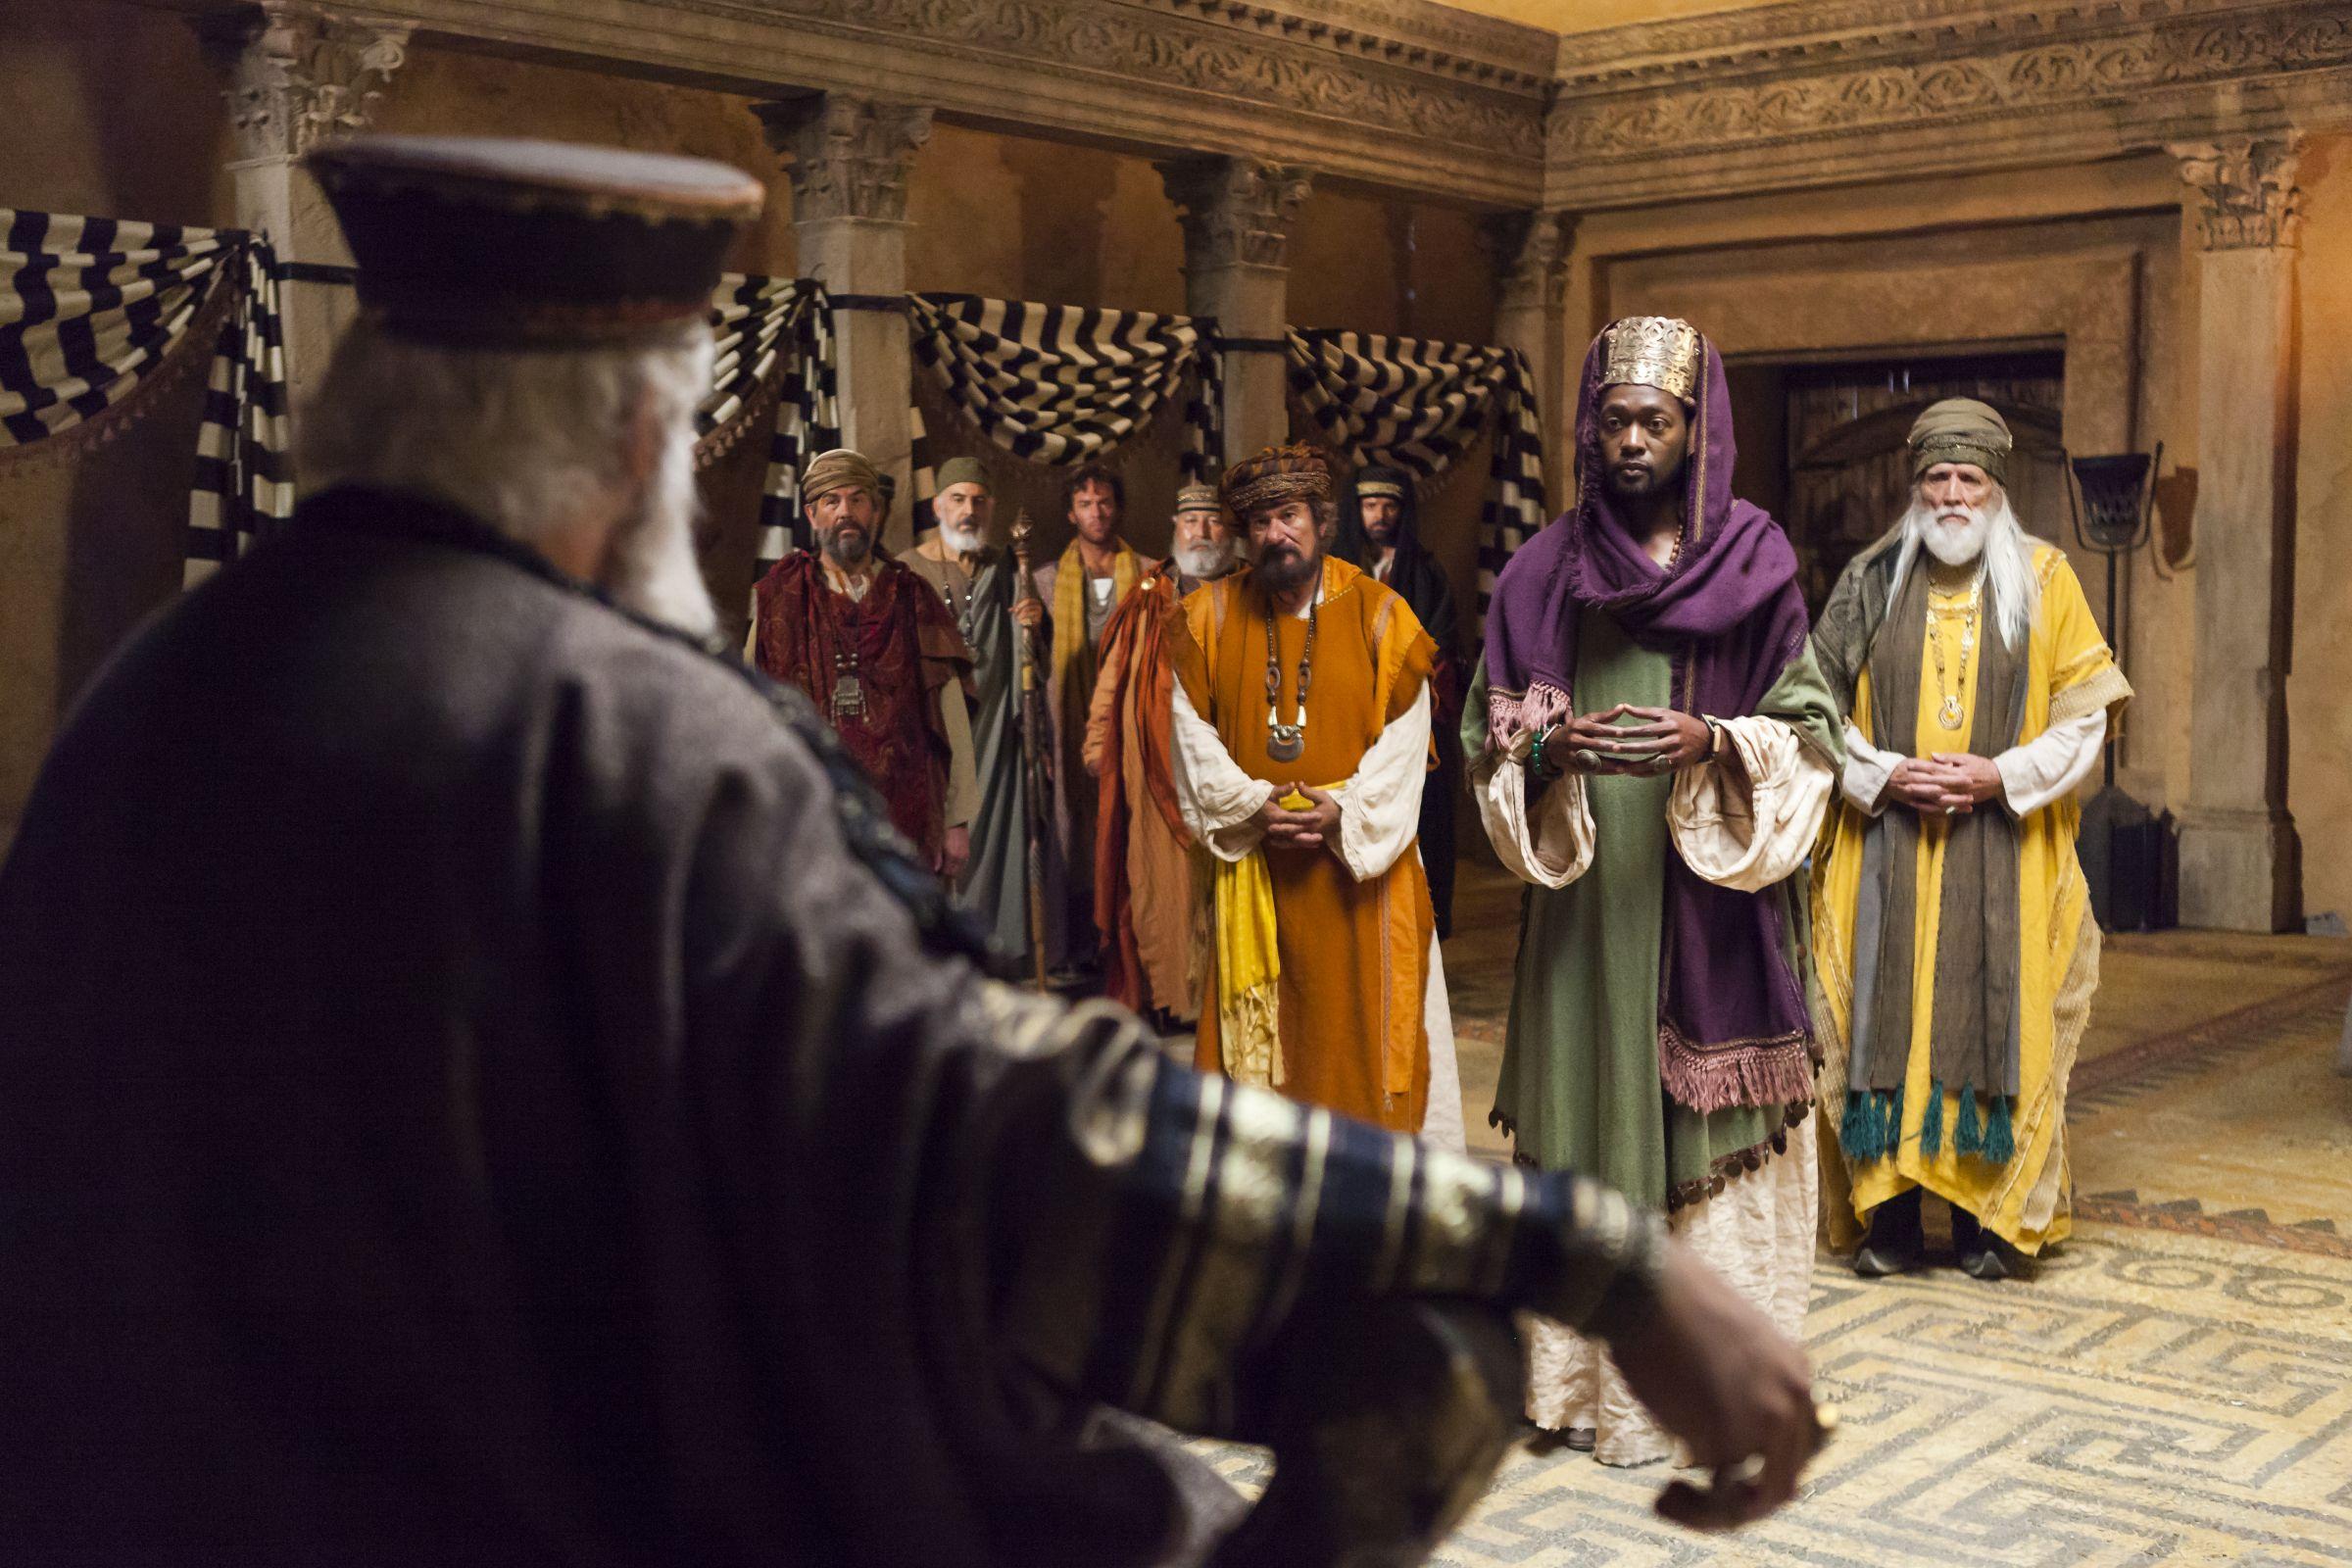 Wise Men before Herod | Wise men, Three wise men, Bible images